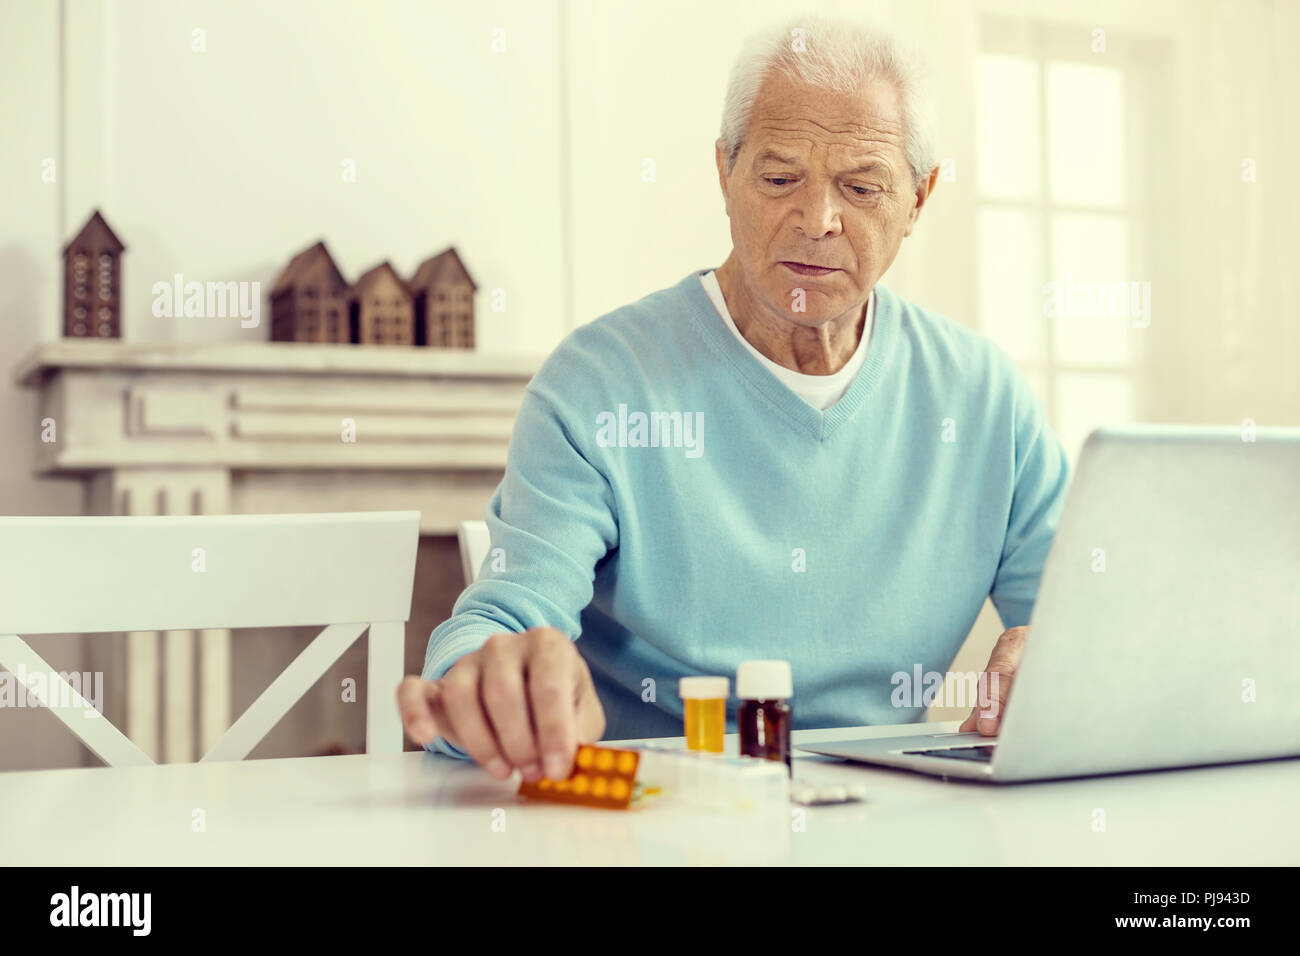 Upset retired man taking his pills while working on laptop - Stock Image